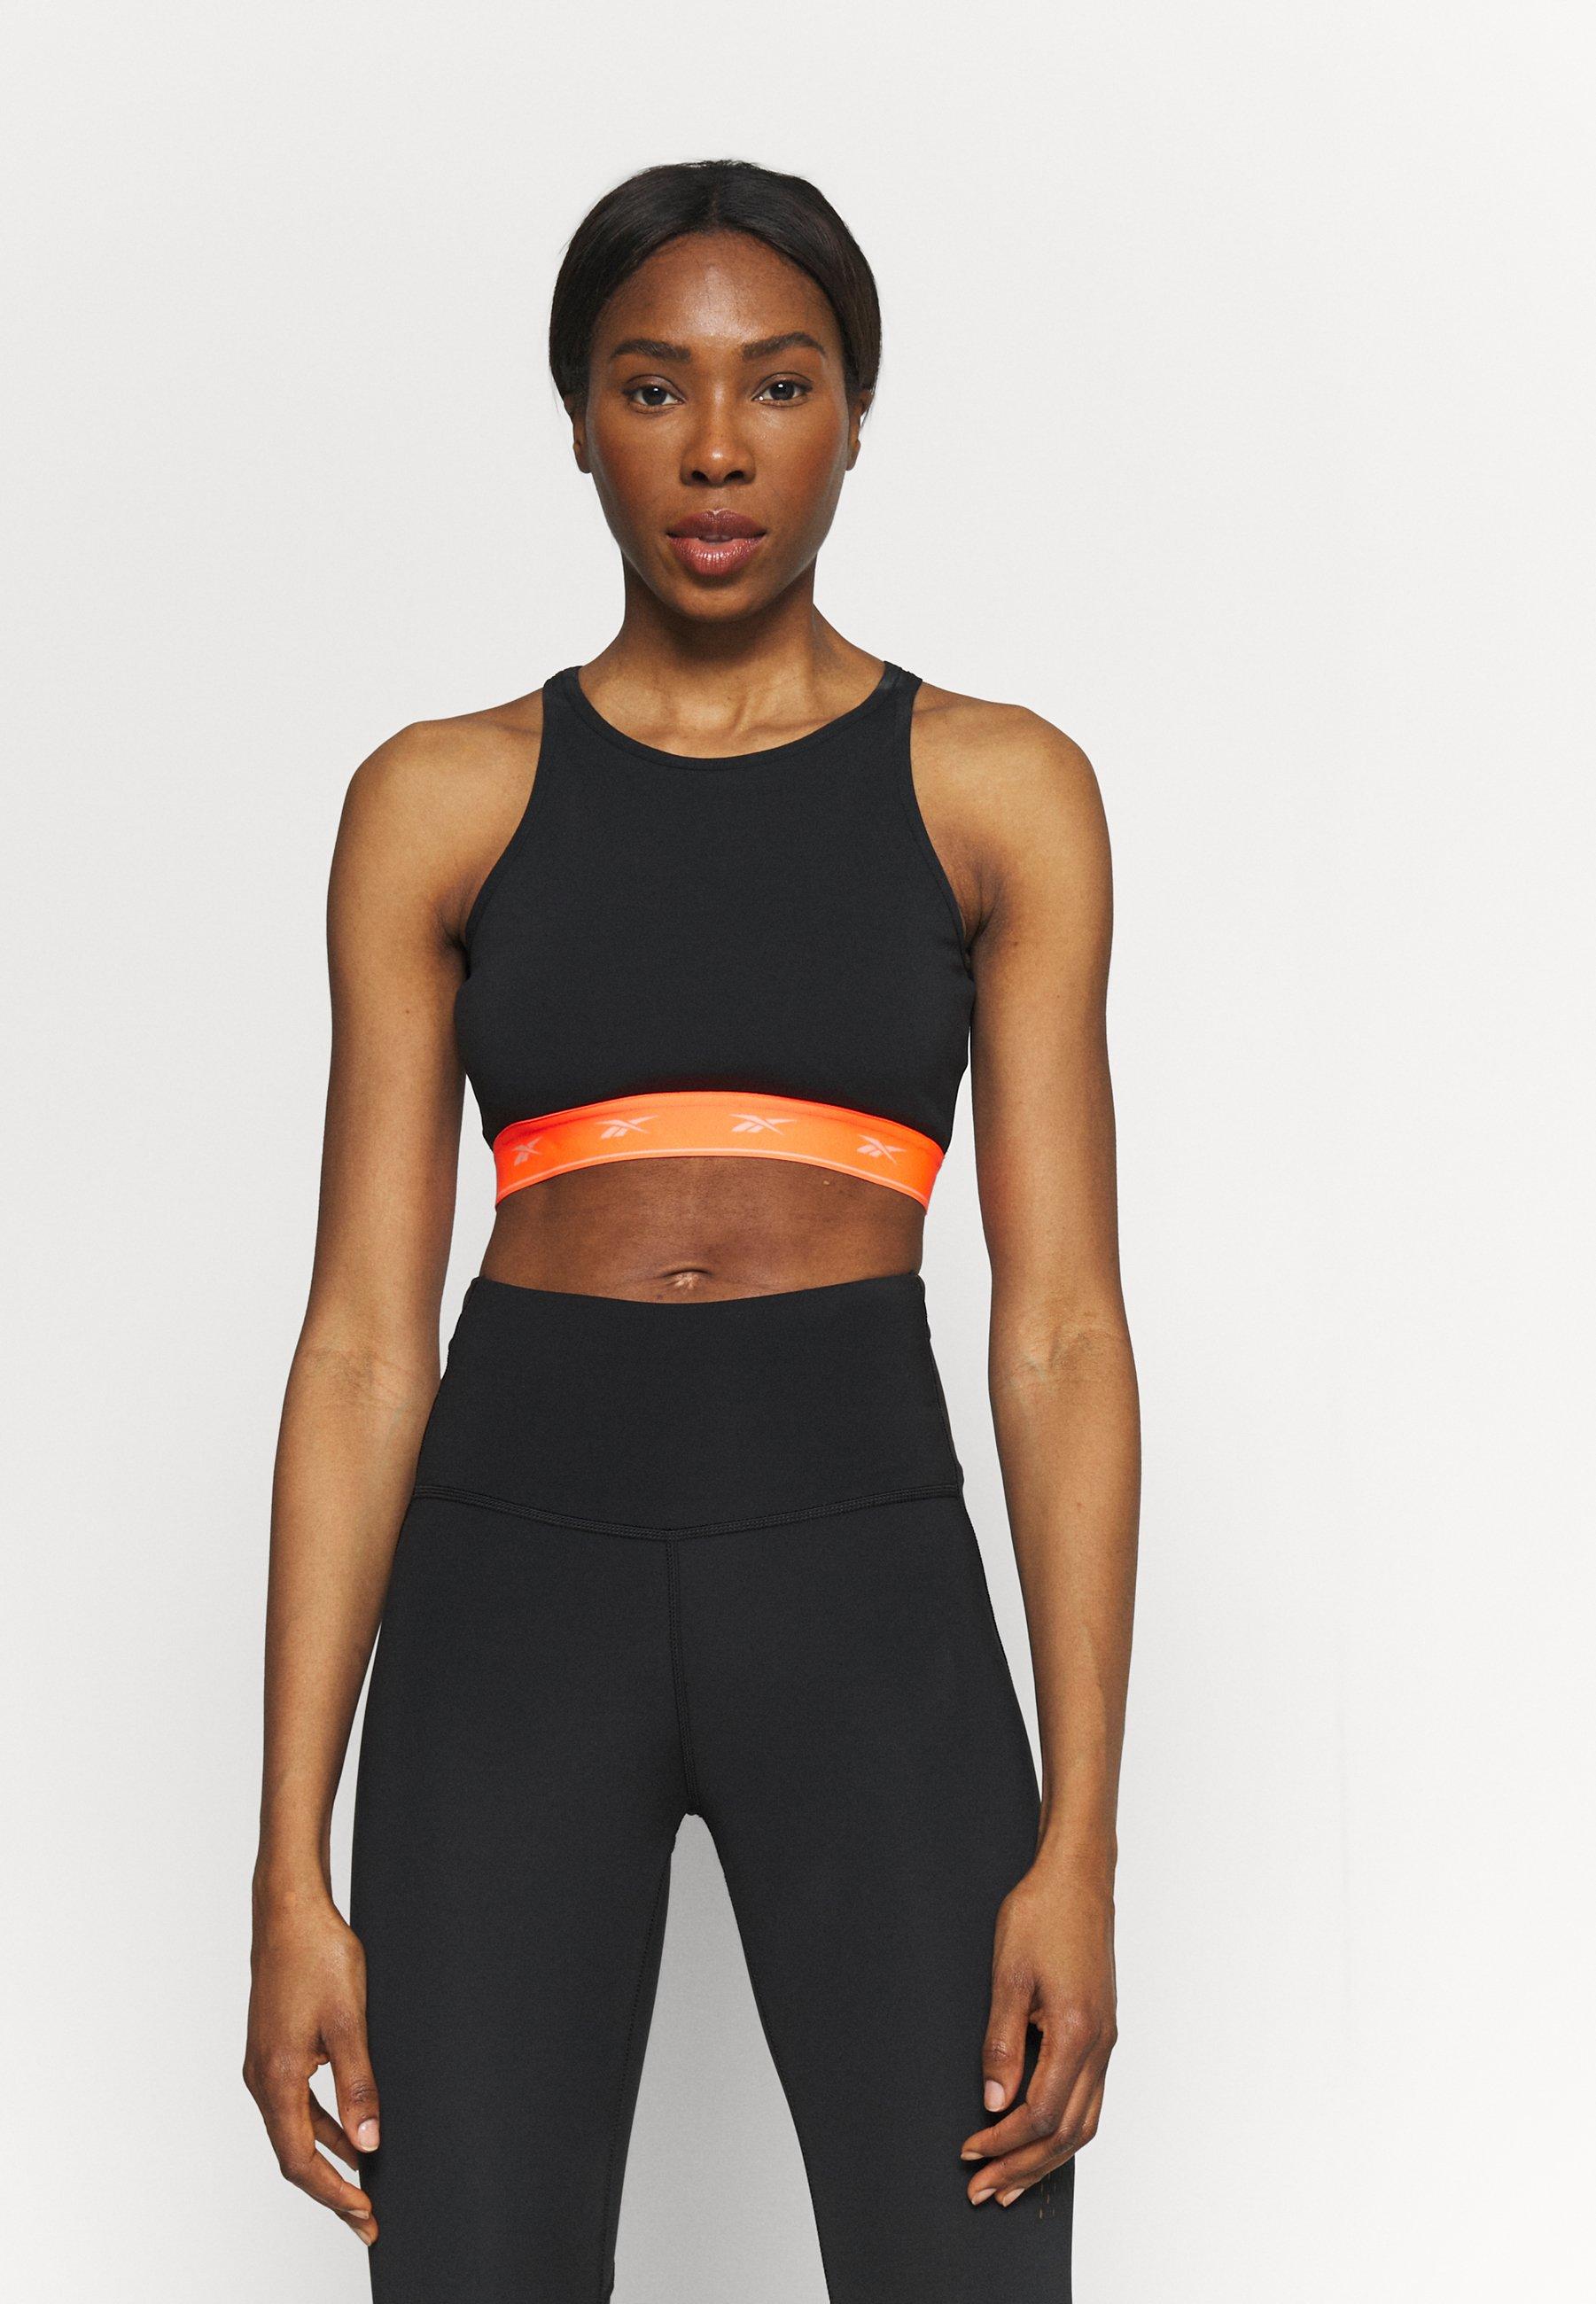 Women BEYOND THE SWEAT CROP - Medium support sports bra